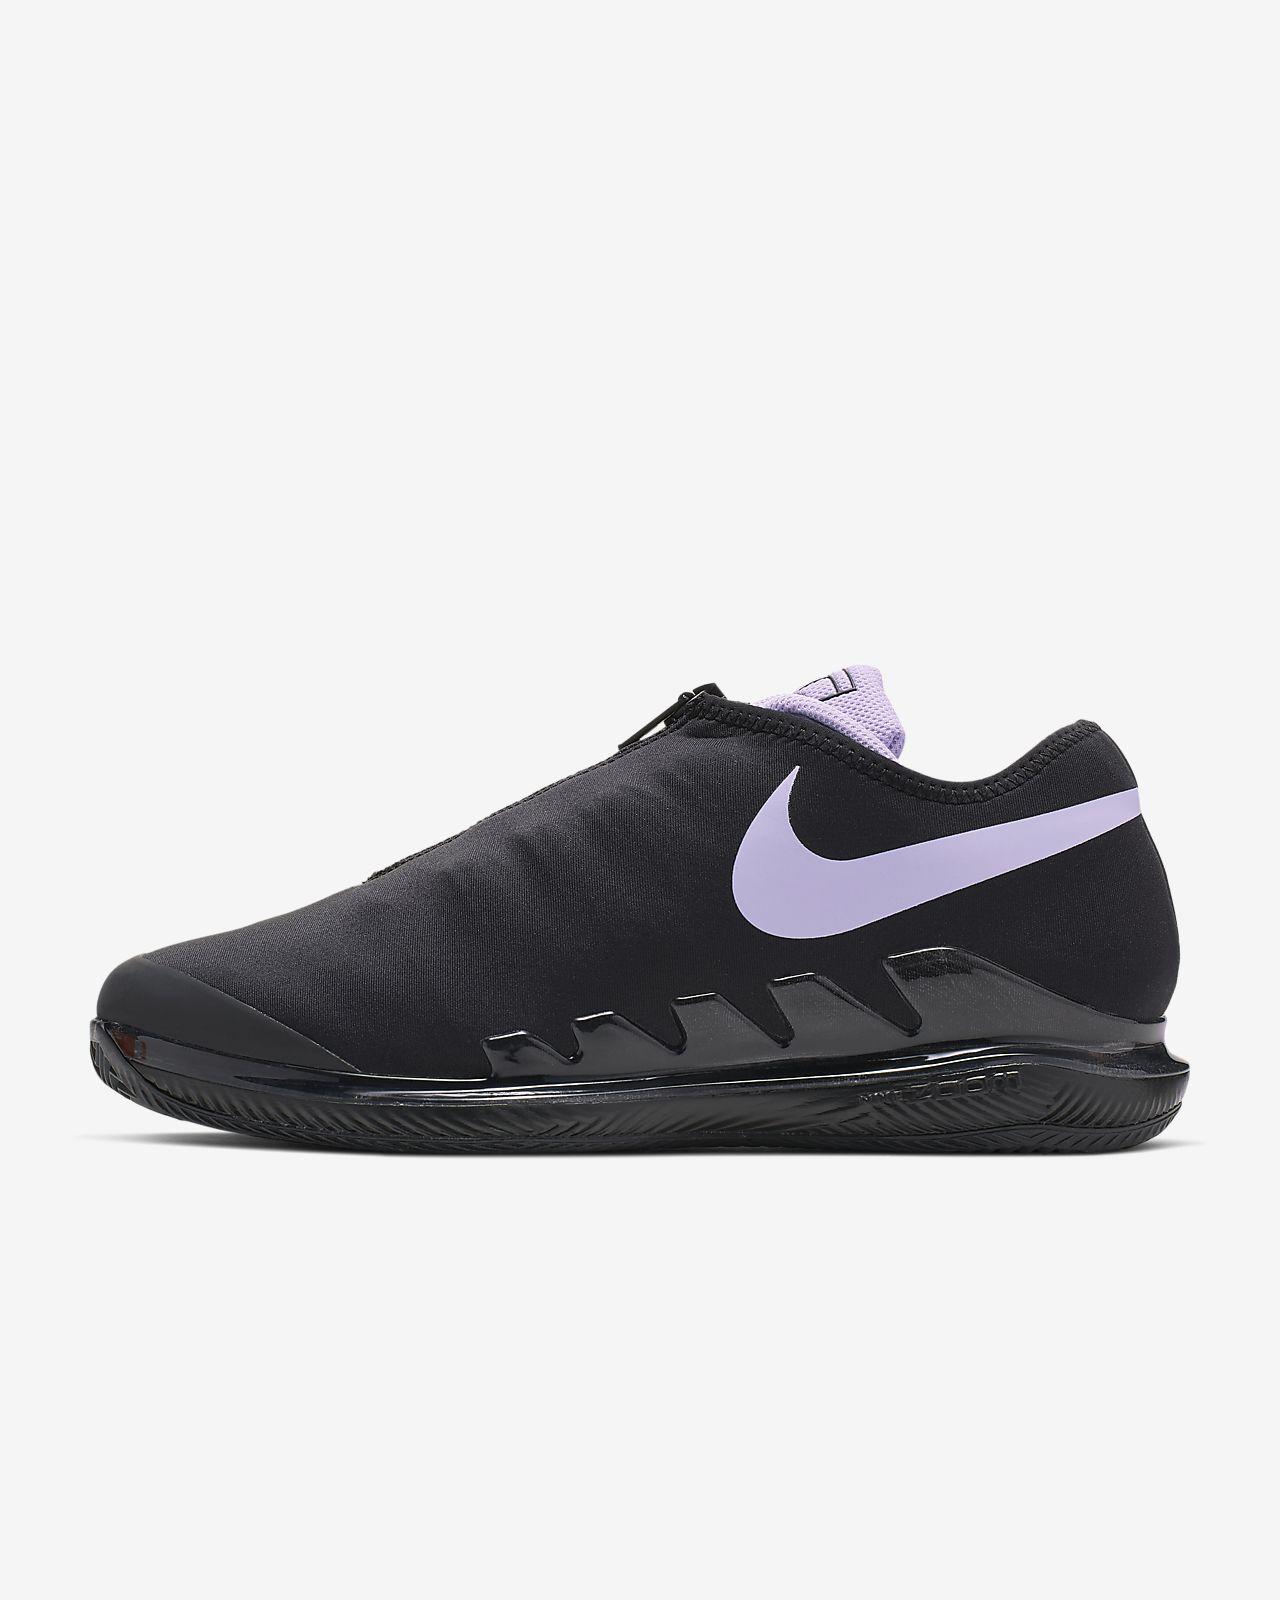 Calzado de tenis para mujer NikeCourt Air Zoom Vapor X Glove